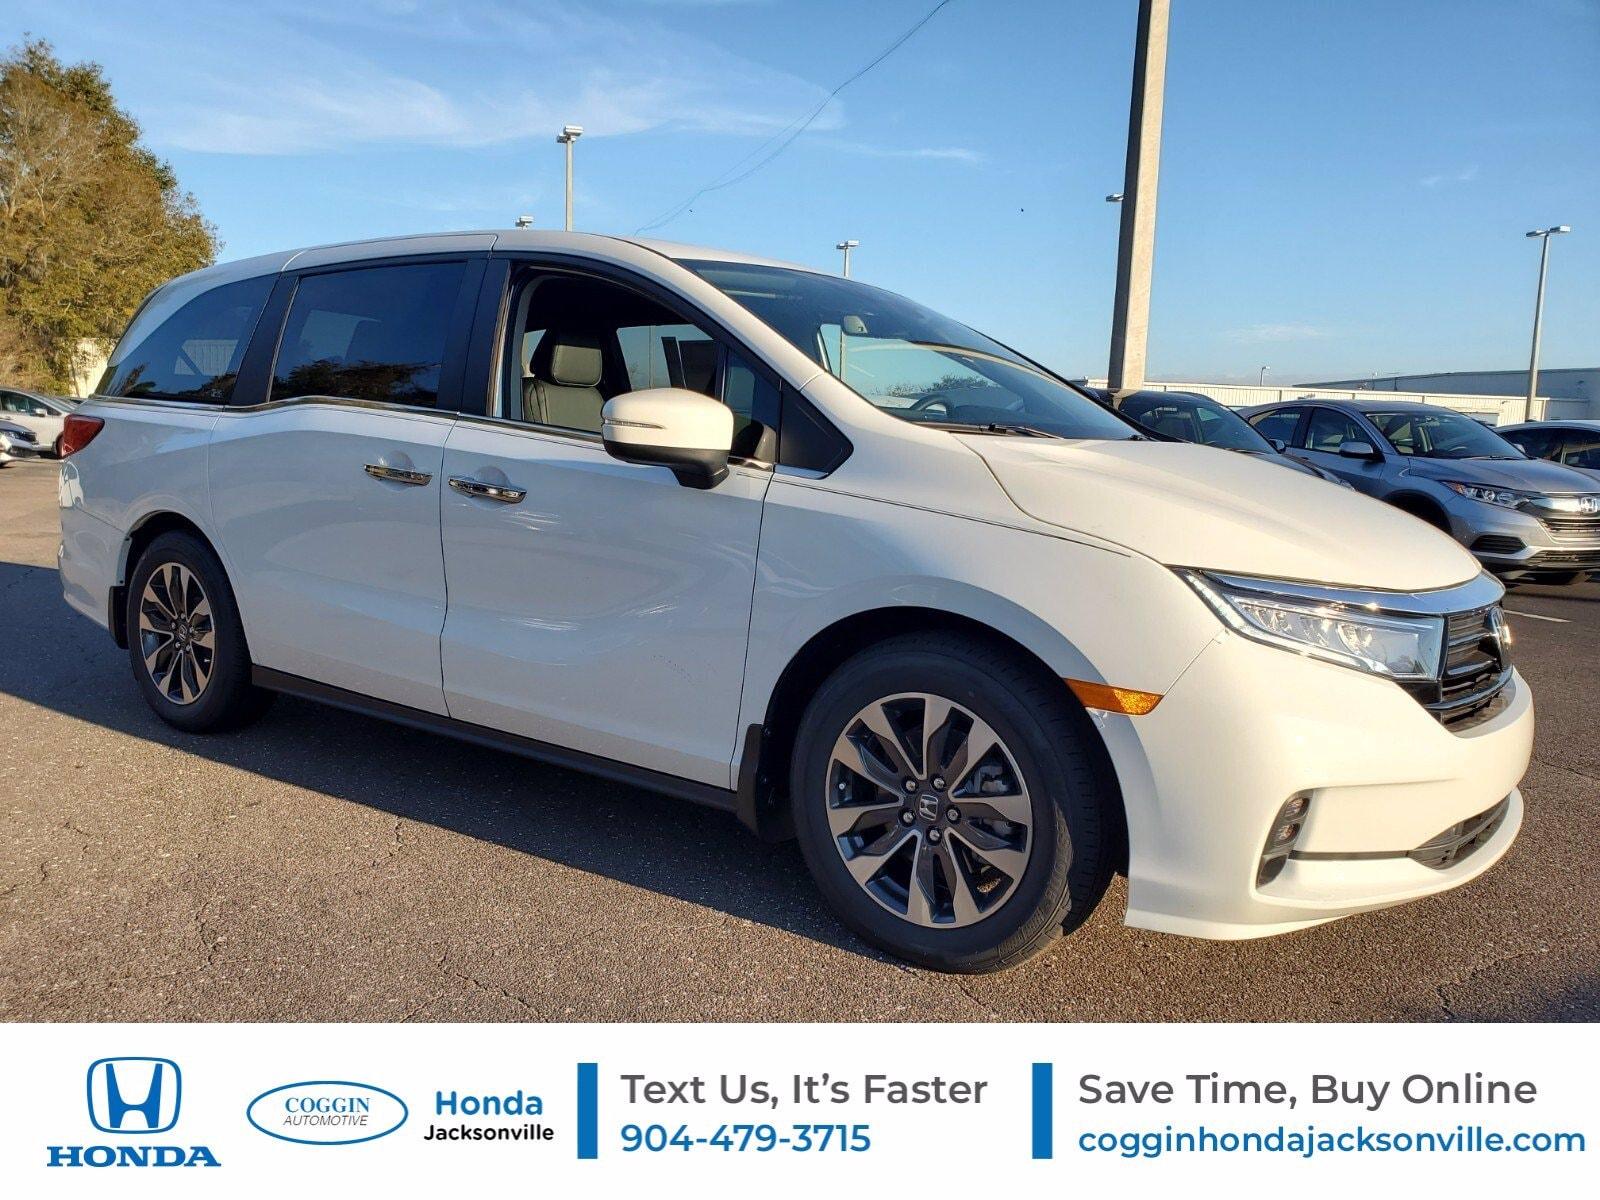 New 2021 Honda Odyssey For Sale At Coggin Honda Jacksonville Vin 5fnrl6h76mb029738